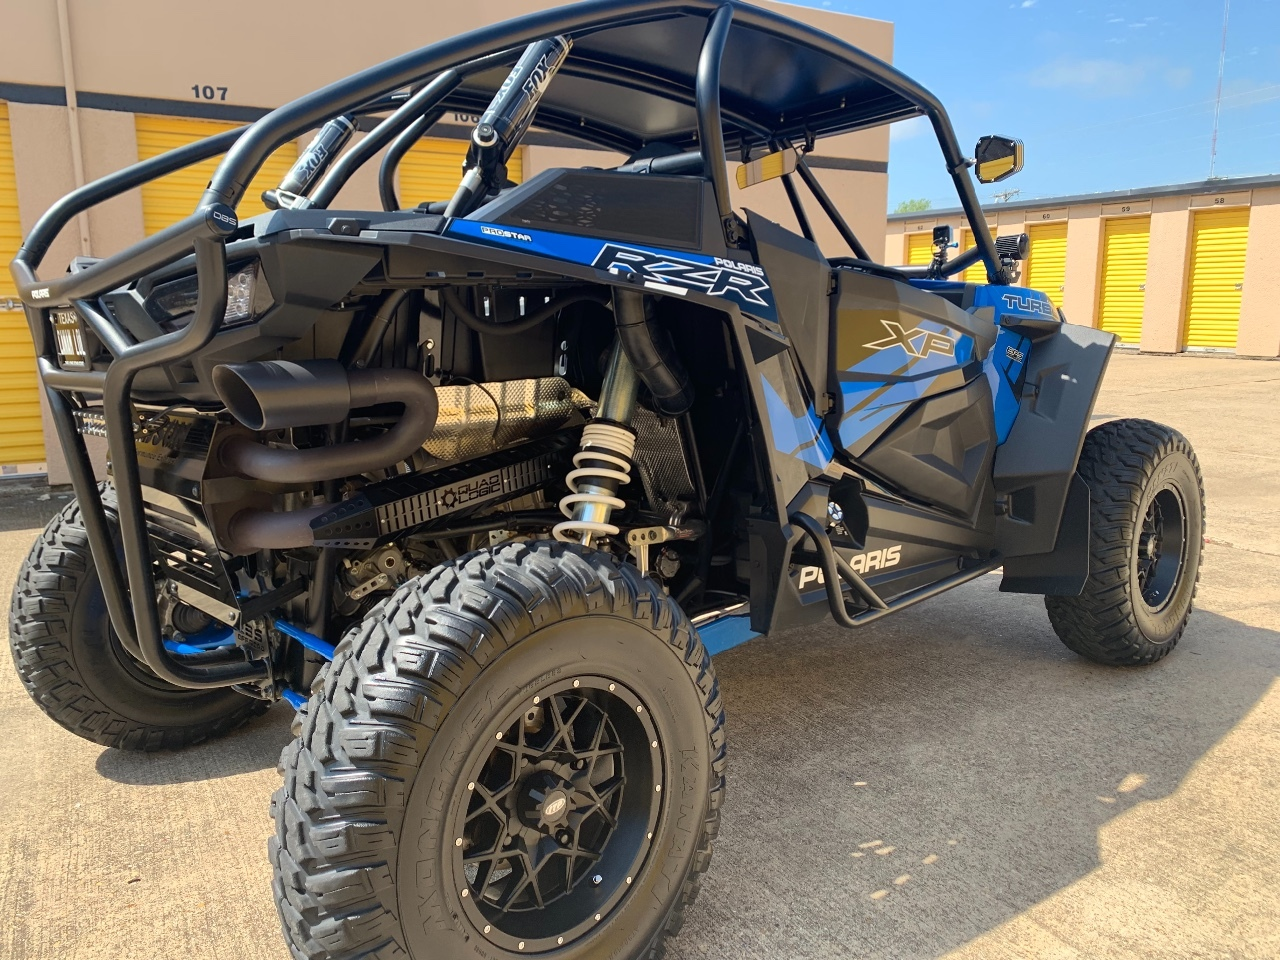 Used Side by Sides For Sale - ATV Trader